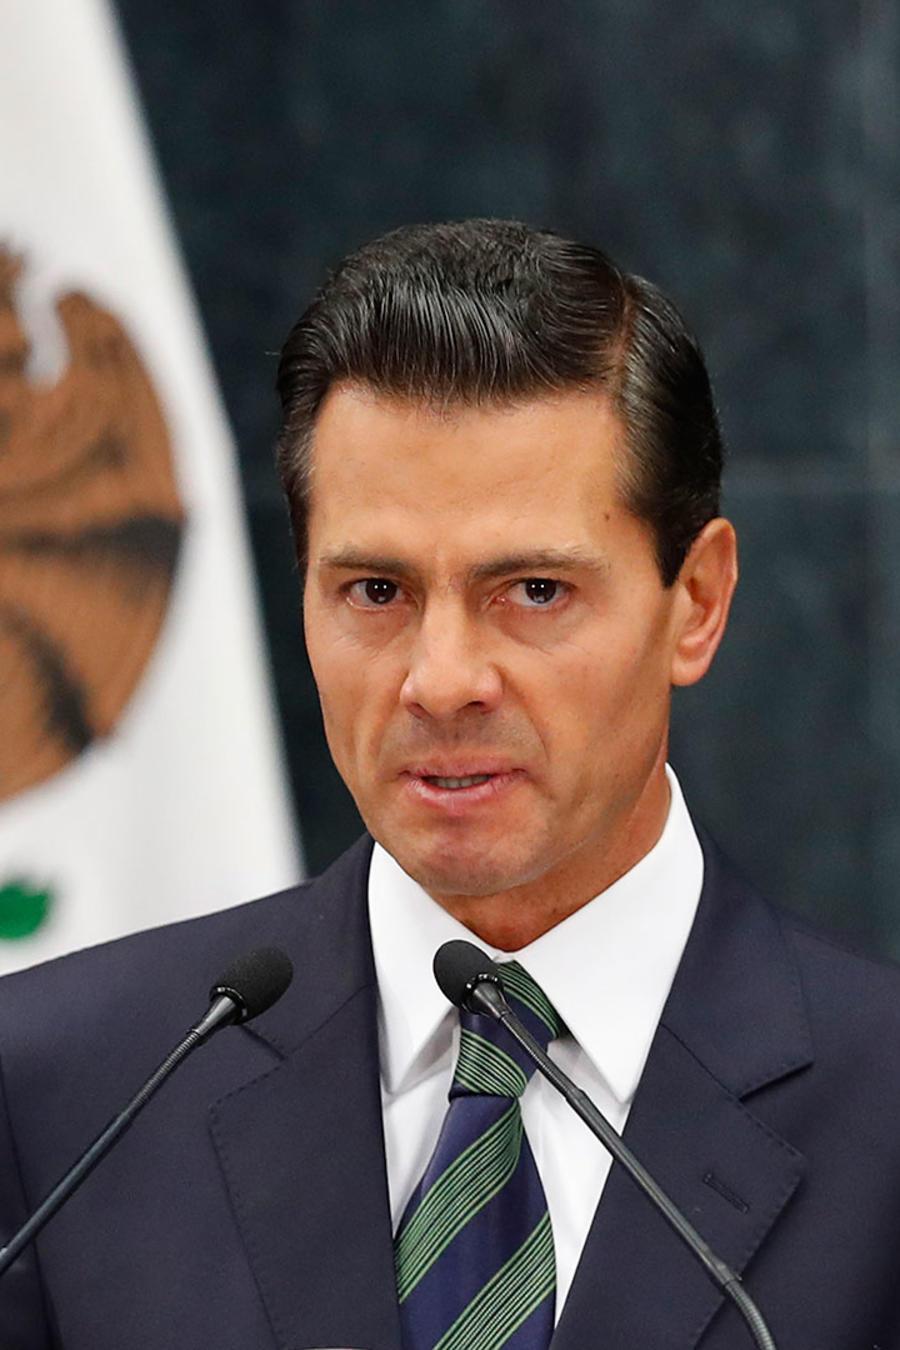 Avión de Peña Nieto